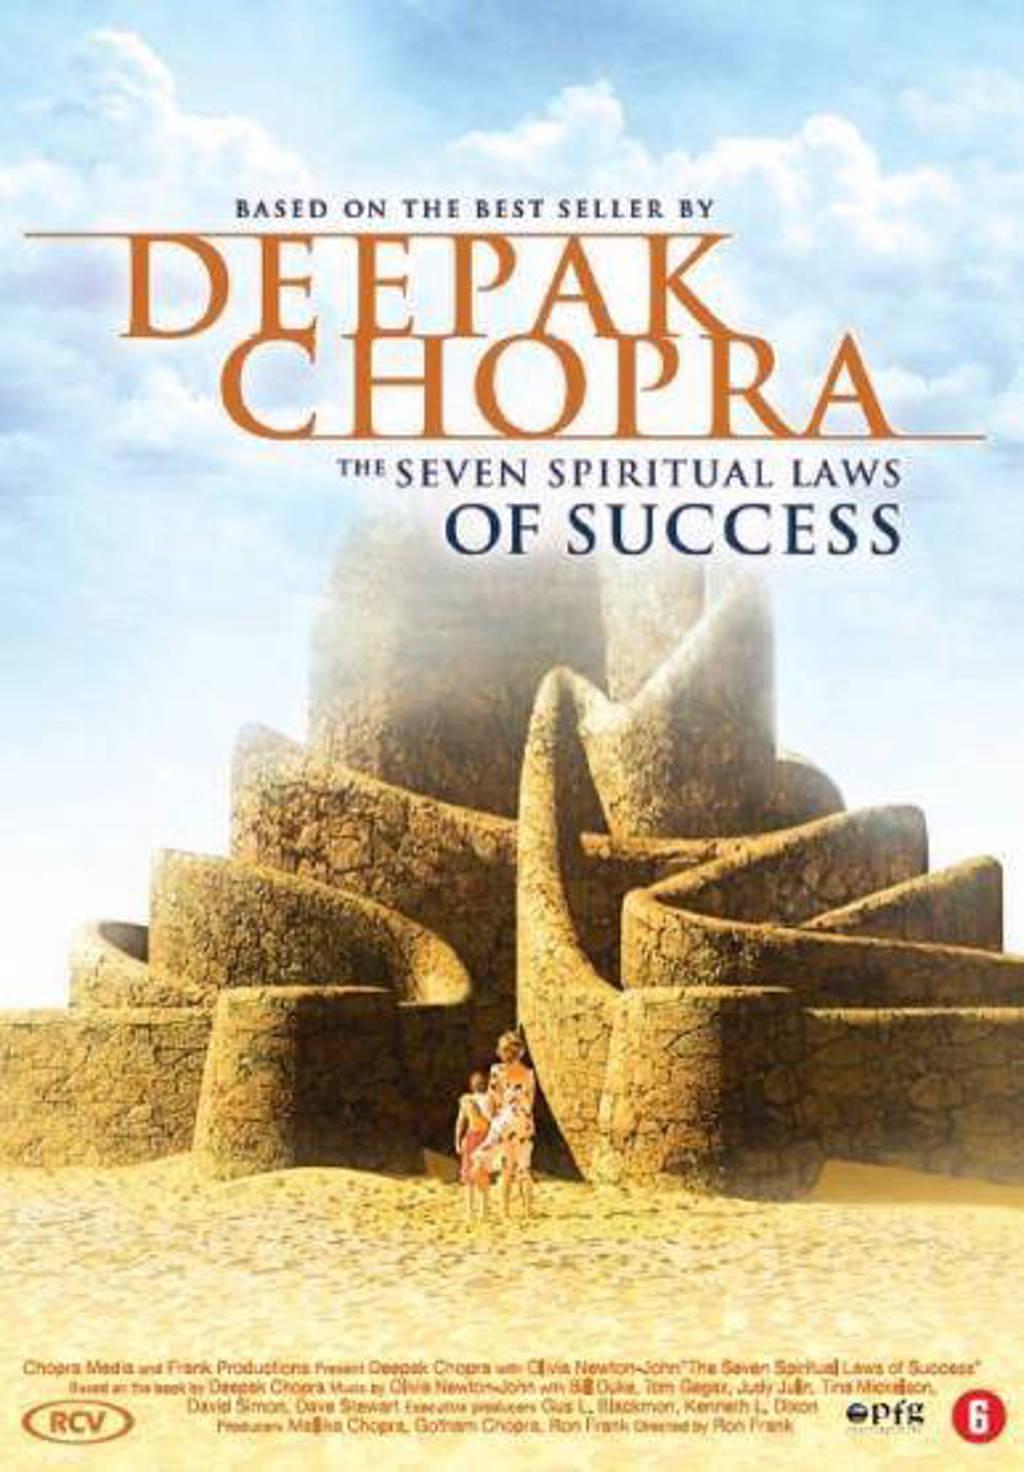 Deepak chopra-the seven spiritual laws of succes (DVD)